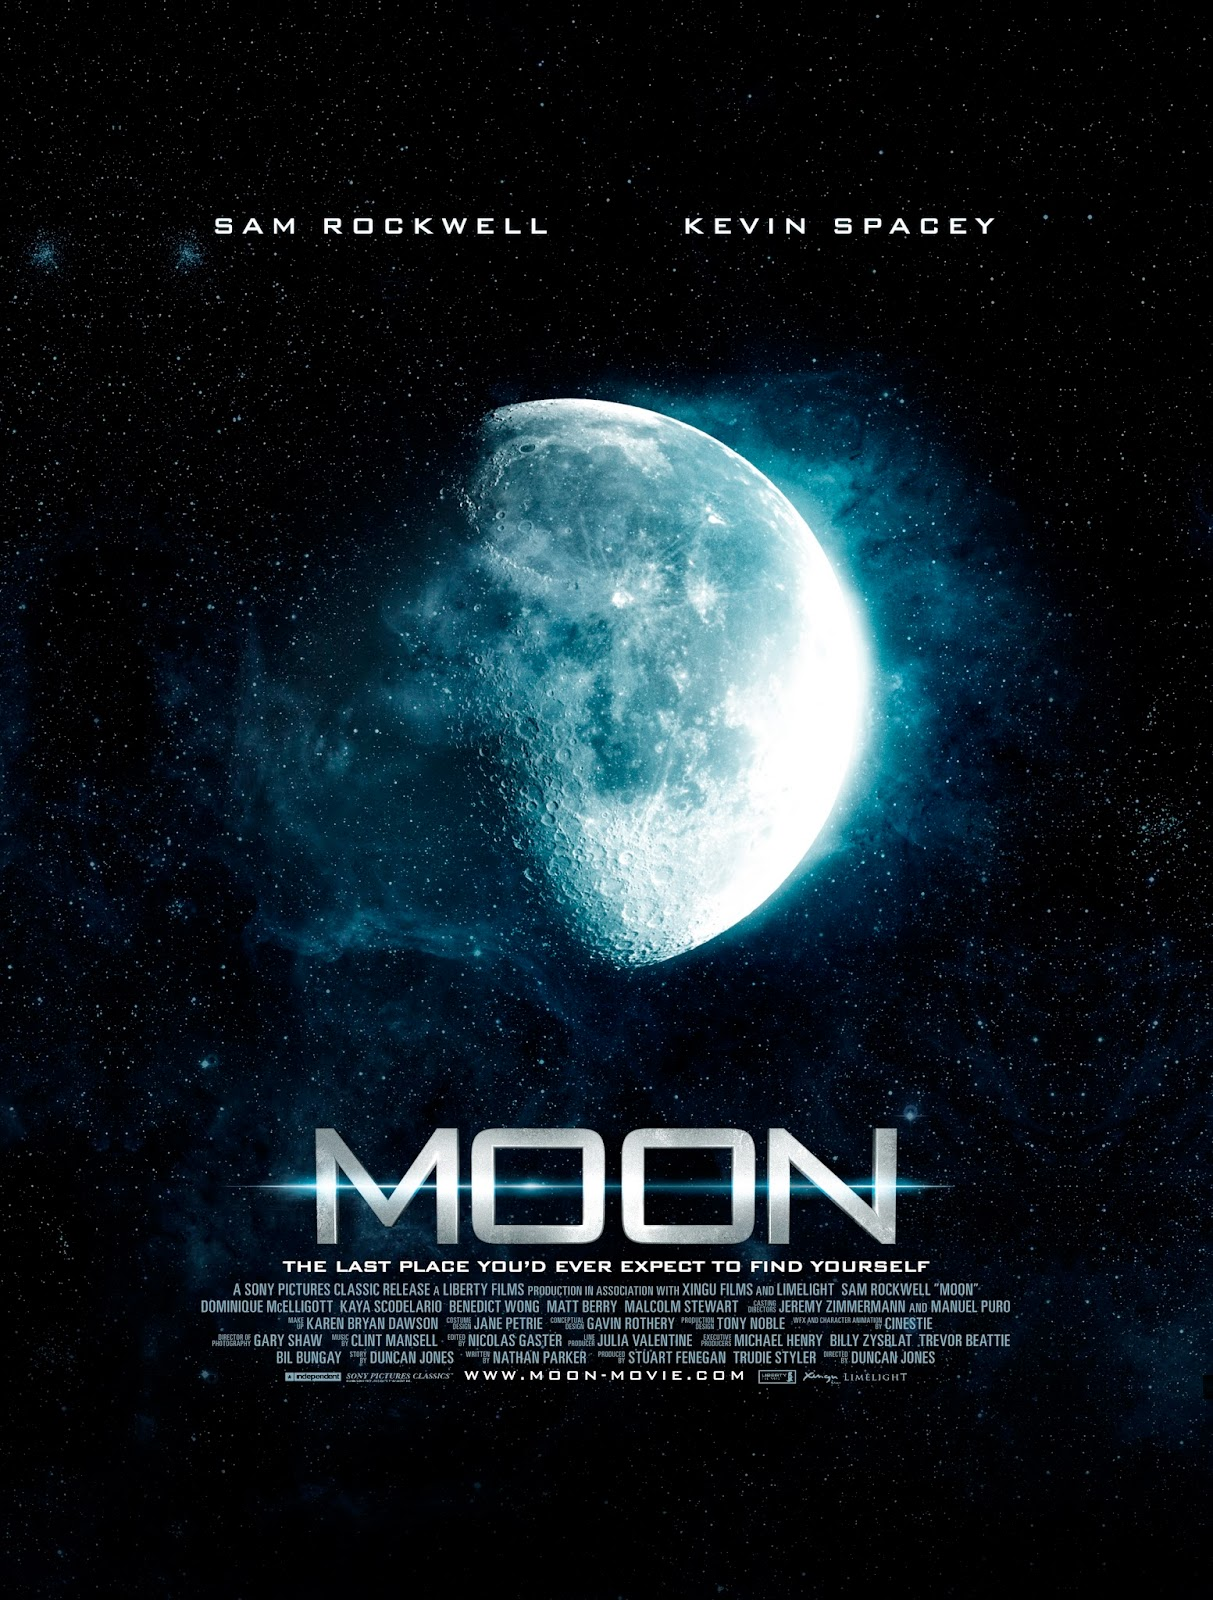 moon recenzja filmu plakat sam rockwell kevin spacey